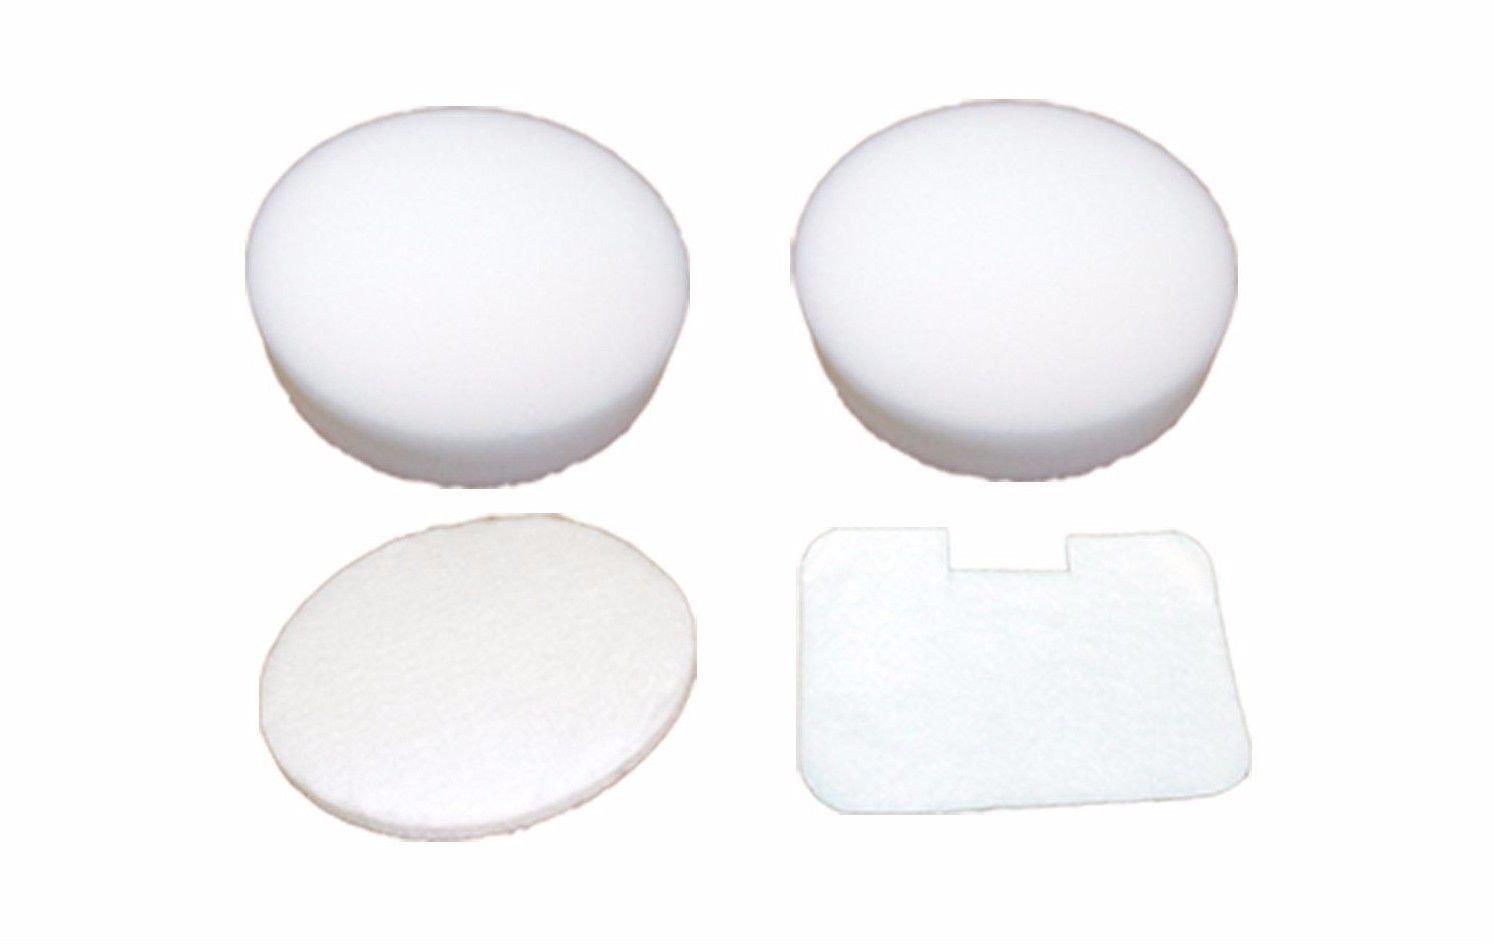 EnviroCare Replacement Allergen Filters for Shark NV22L Navigator Uprights. 4 Piece Foam and Felt Filter Kit